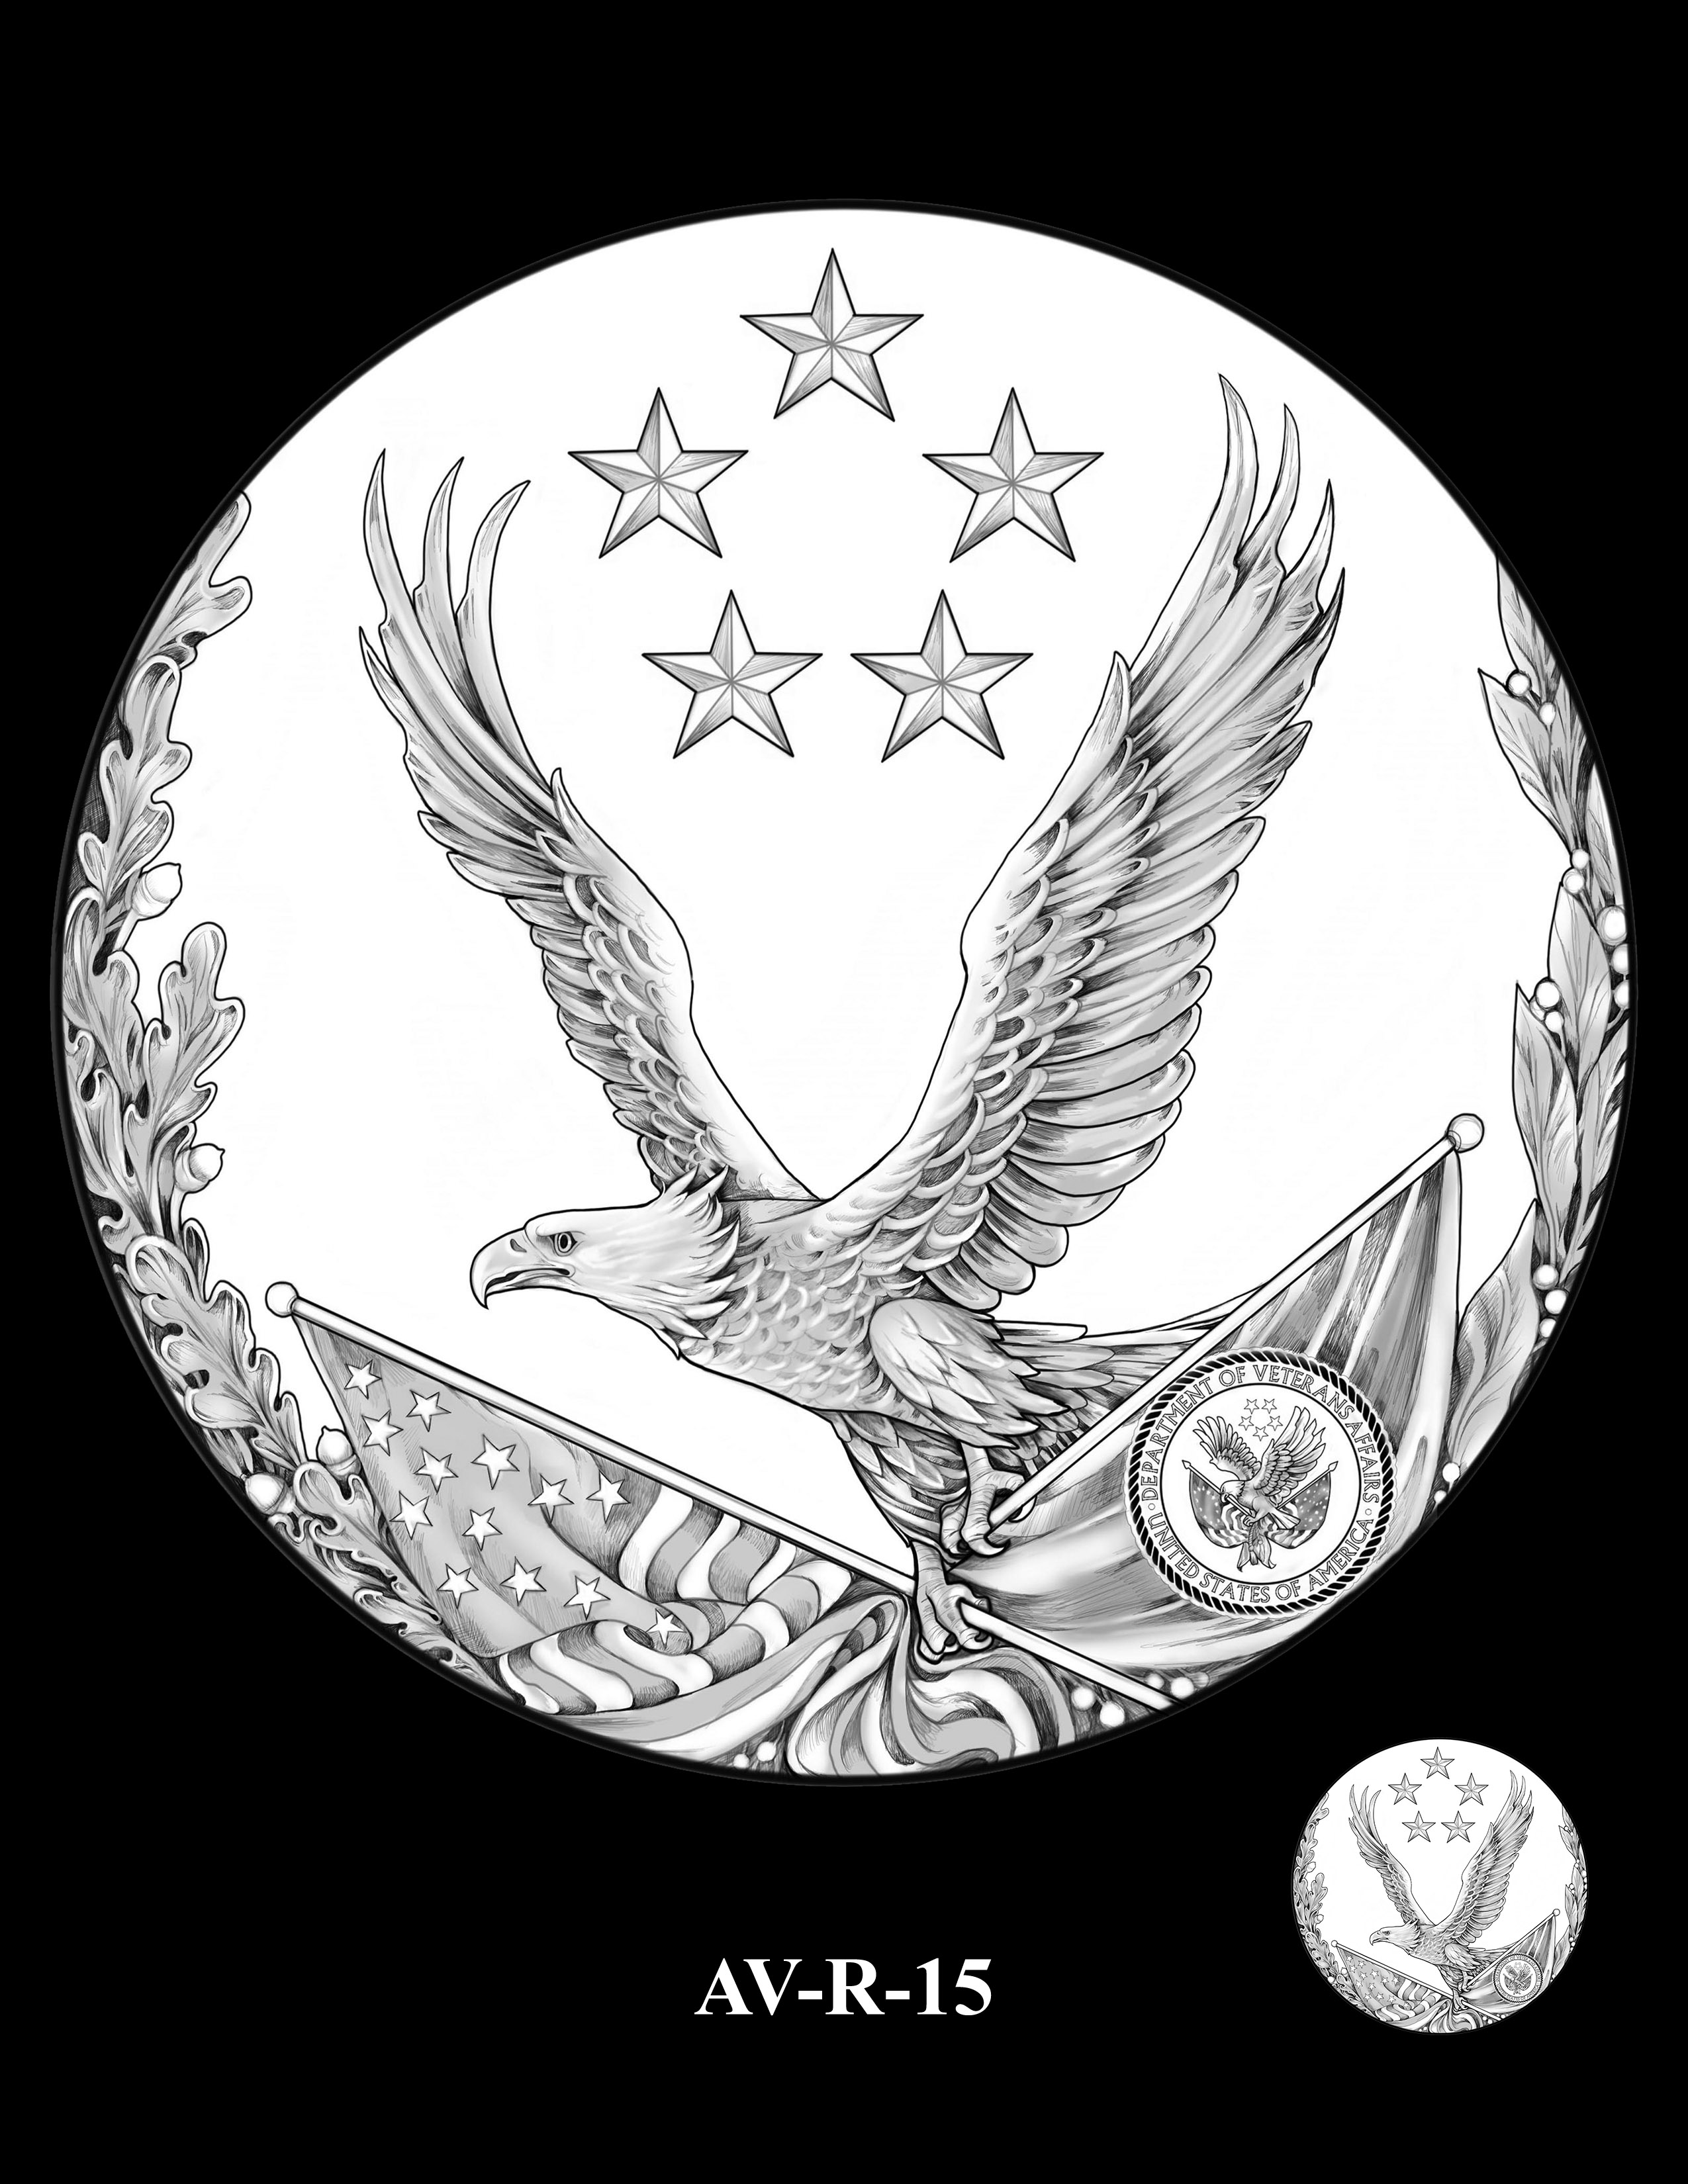 AV-R-15 - American Veterans Medal